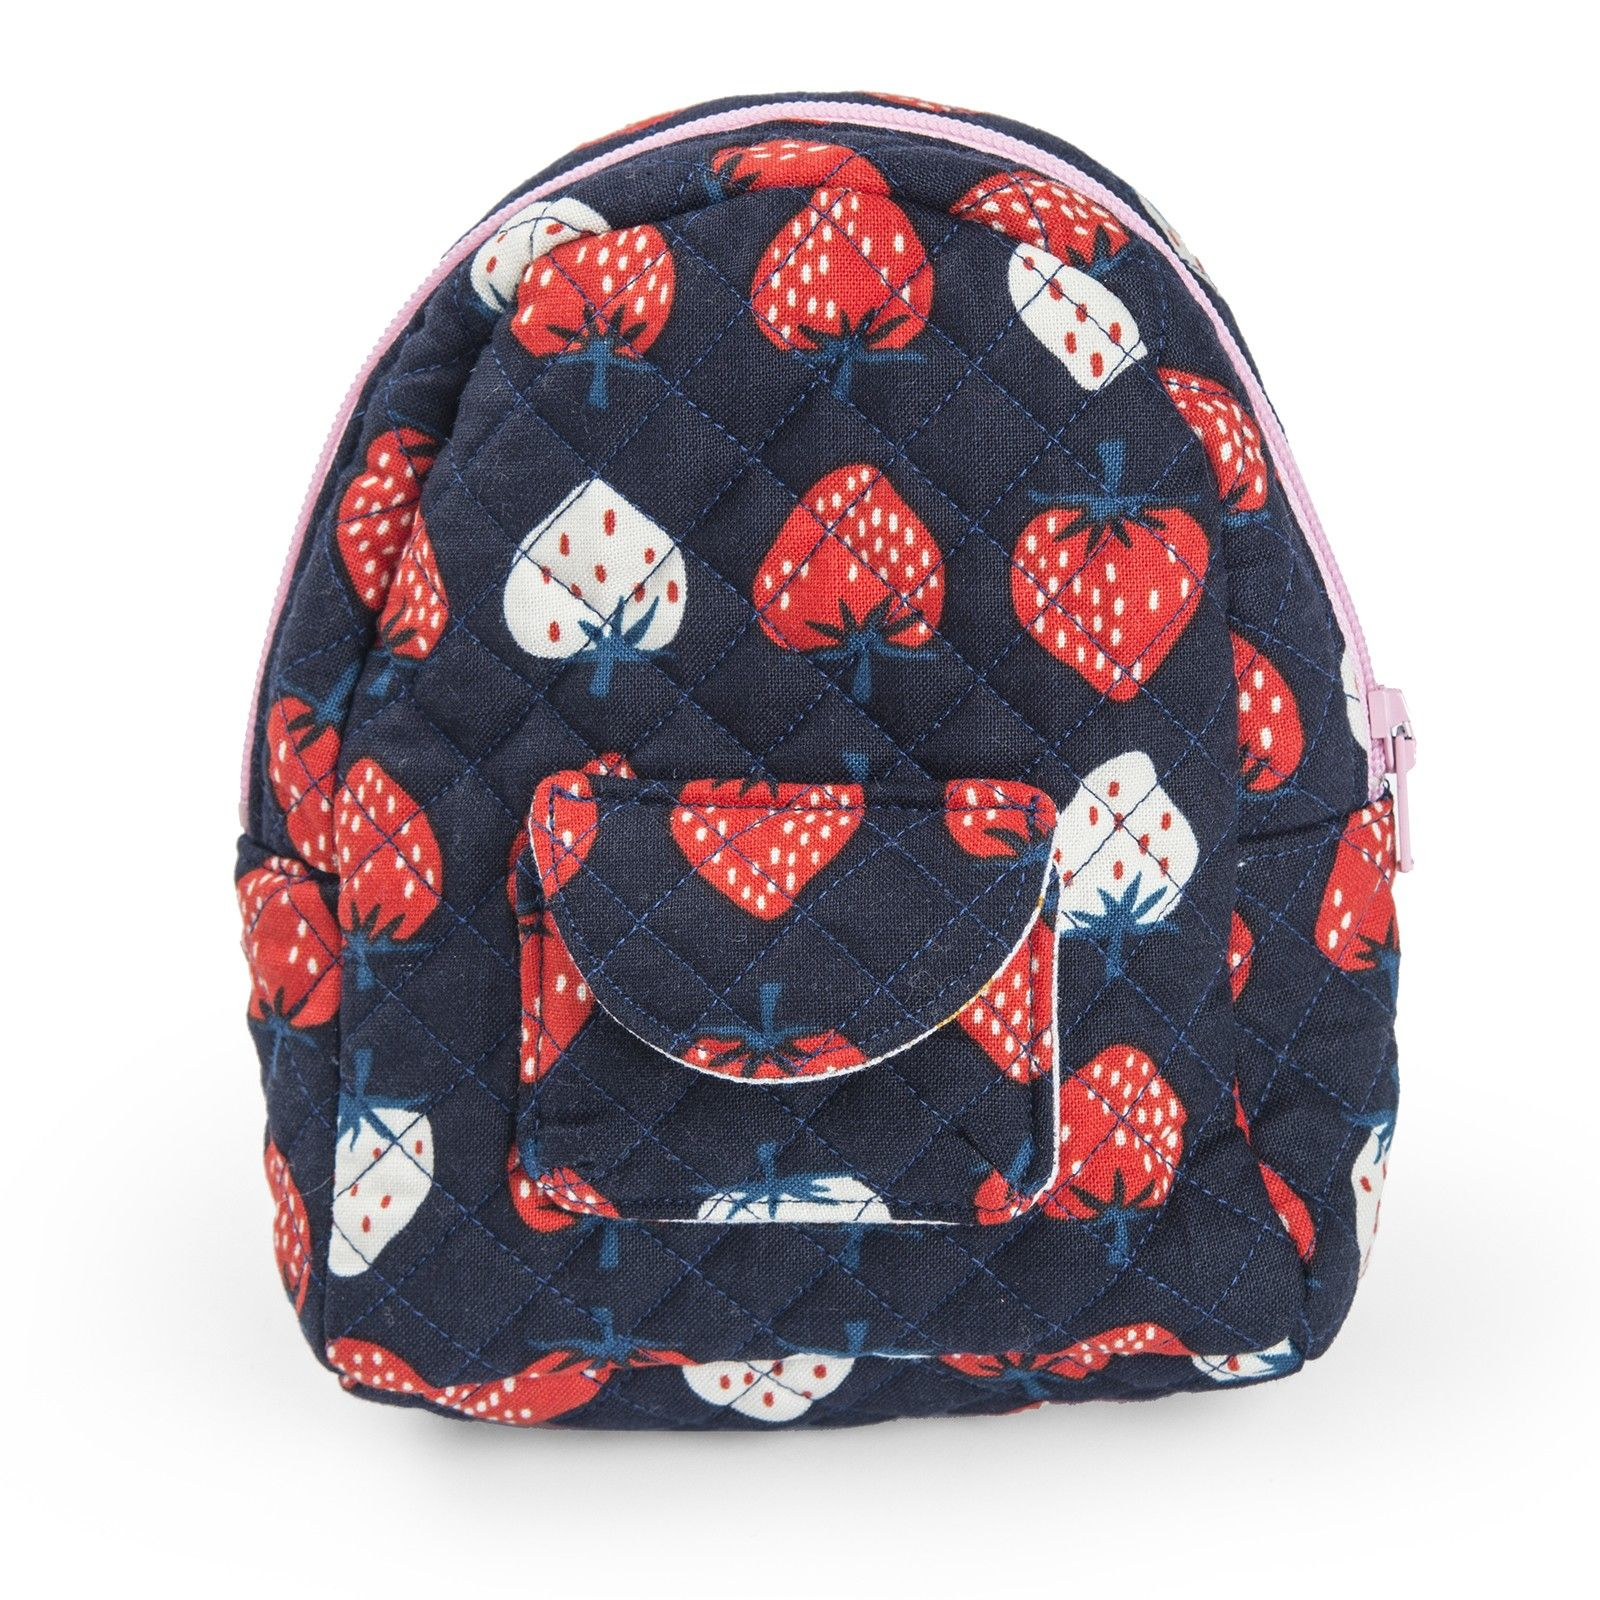 Sizzix Bigz Plus Q Die Doll Backpack Fits 18